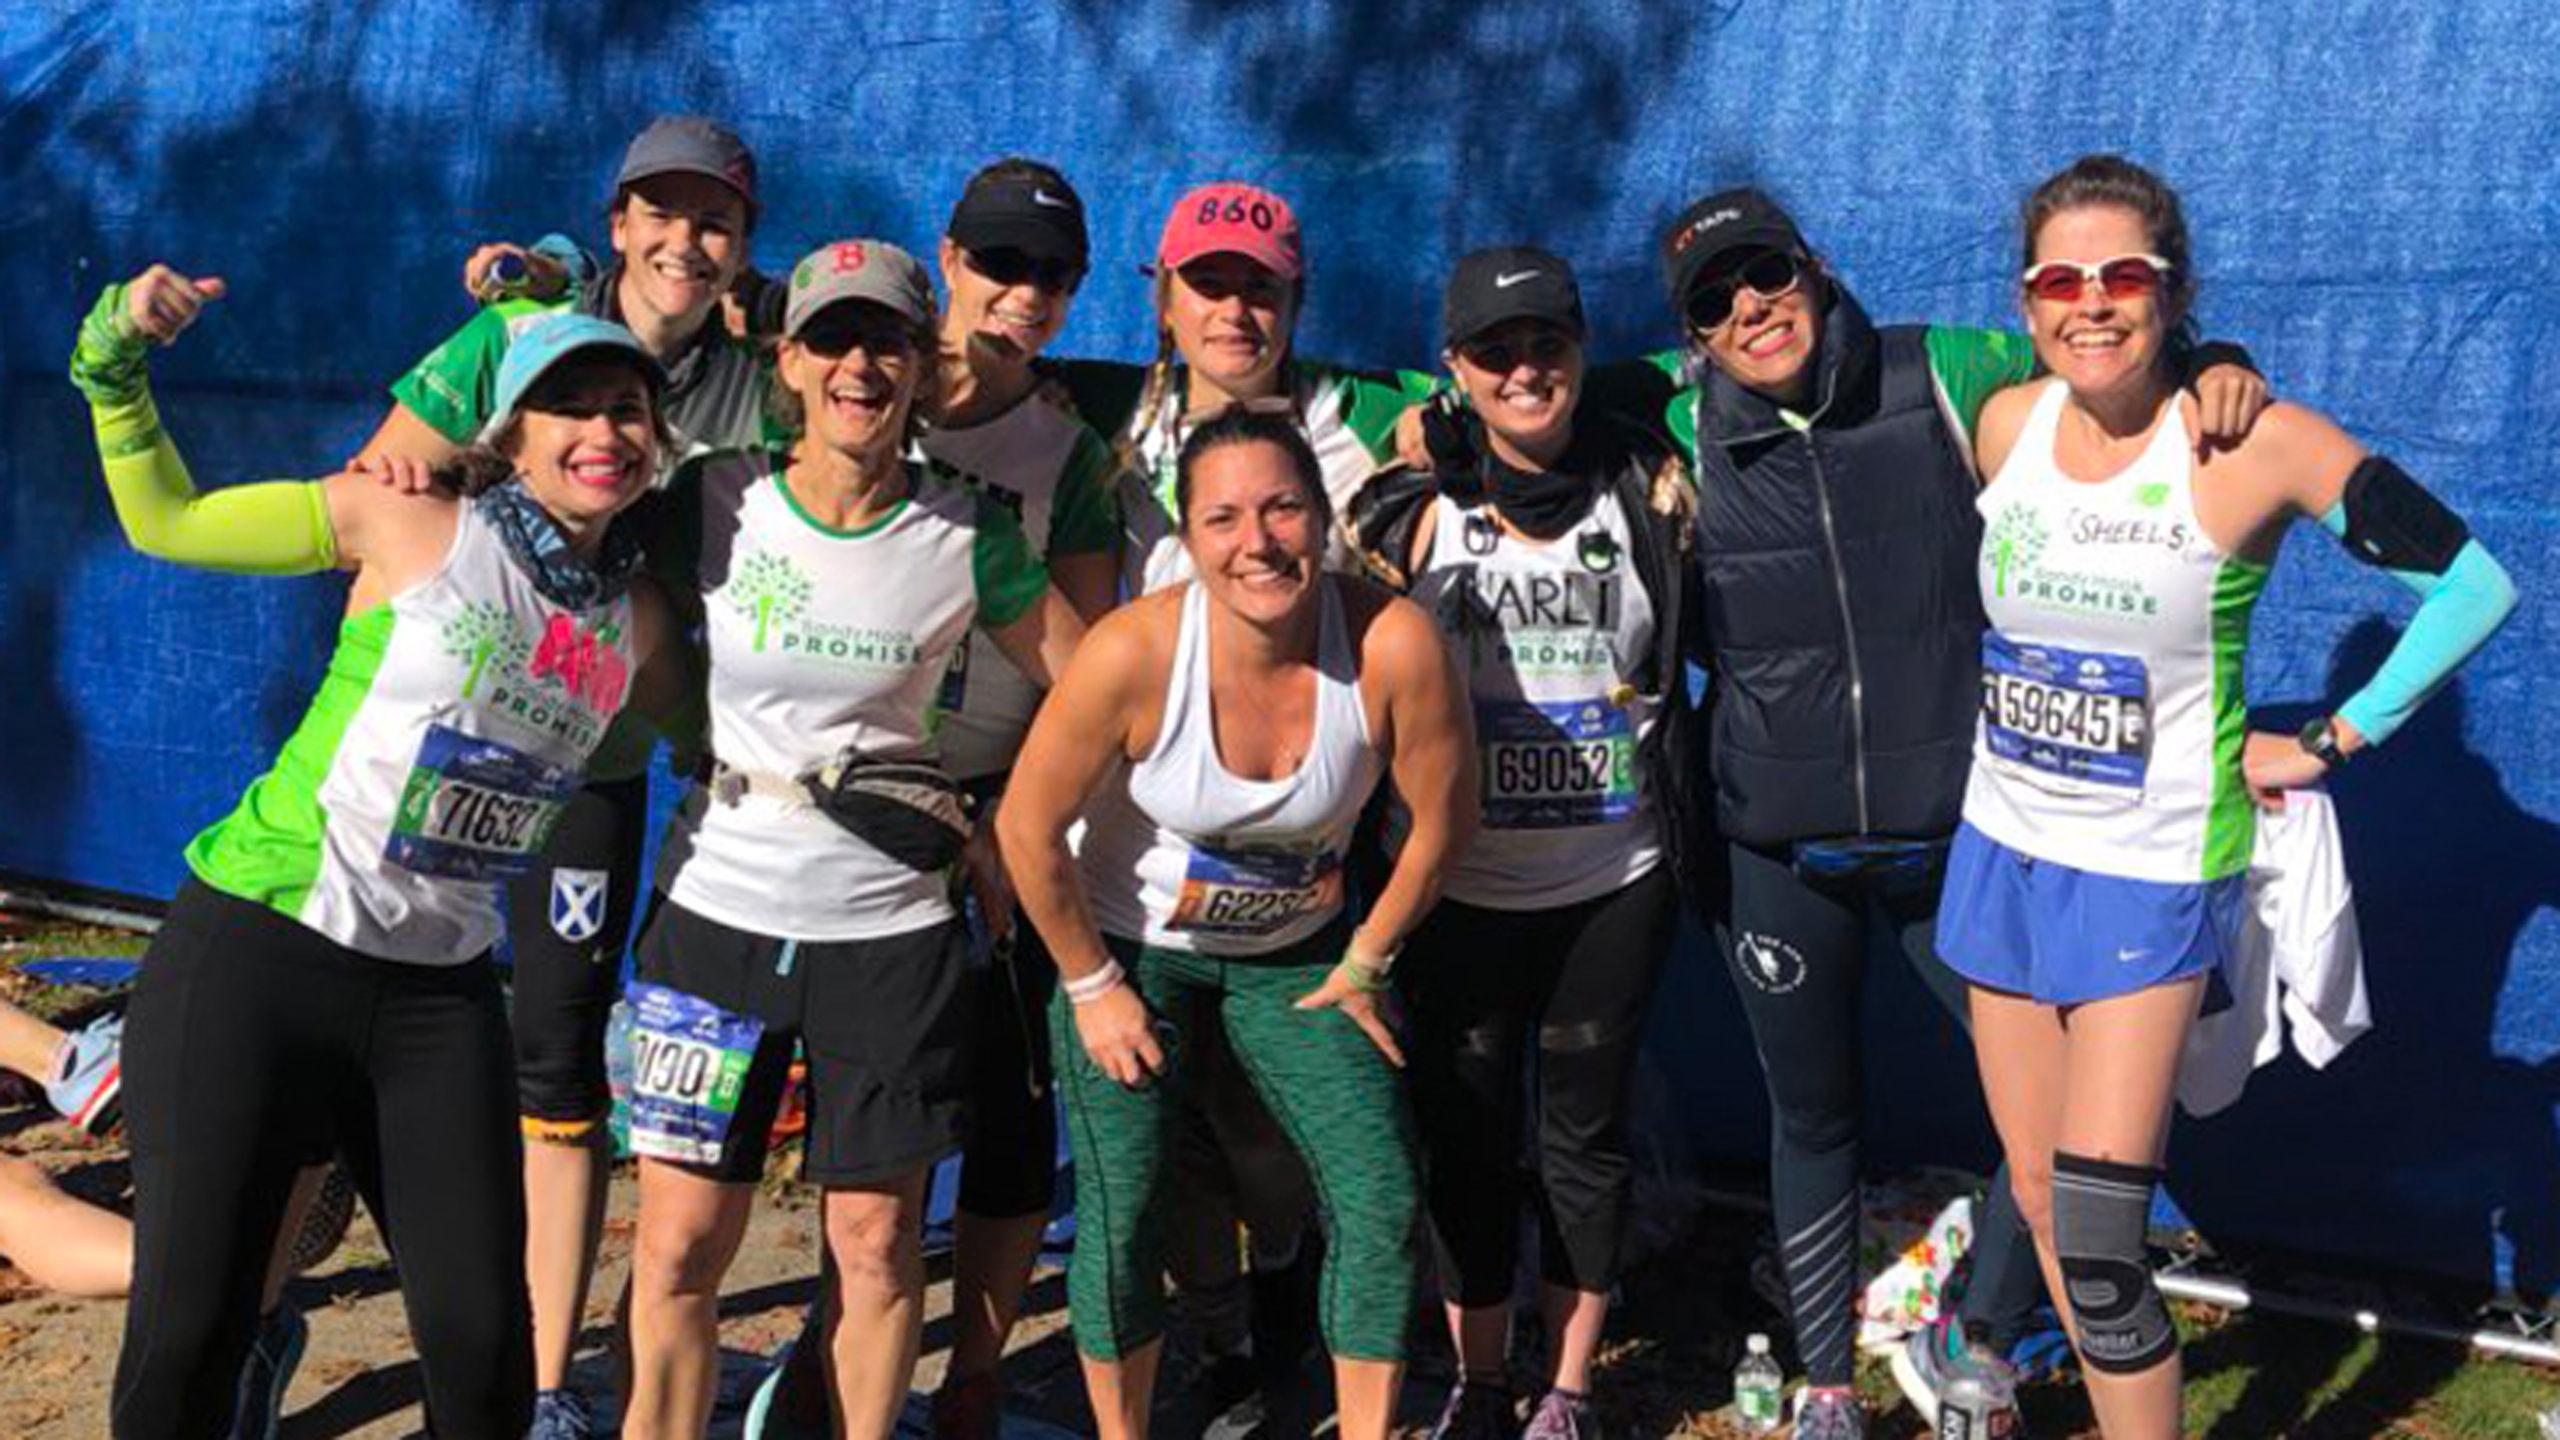 Team Sandy Hook Promise at the NYC Marathon